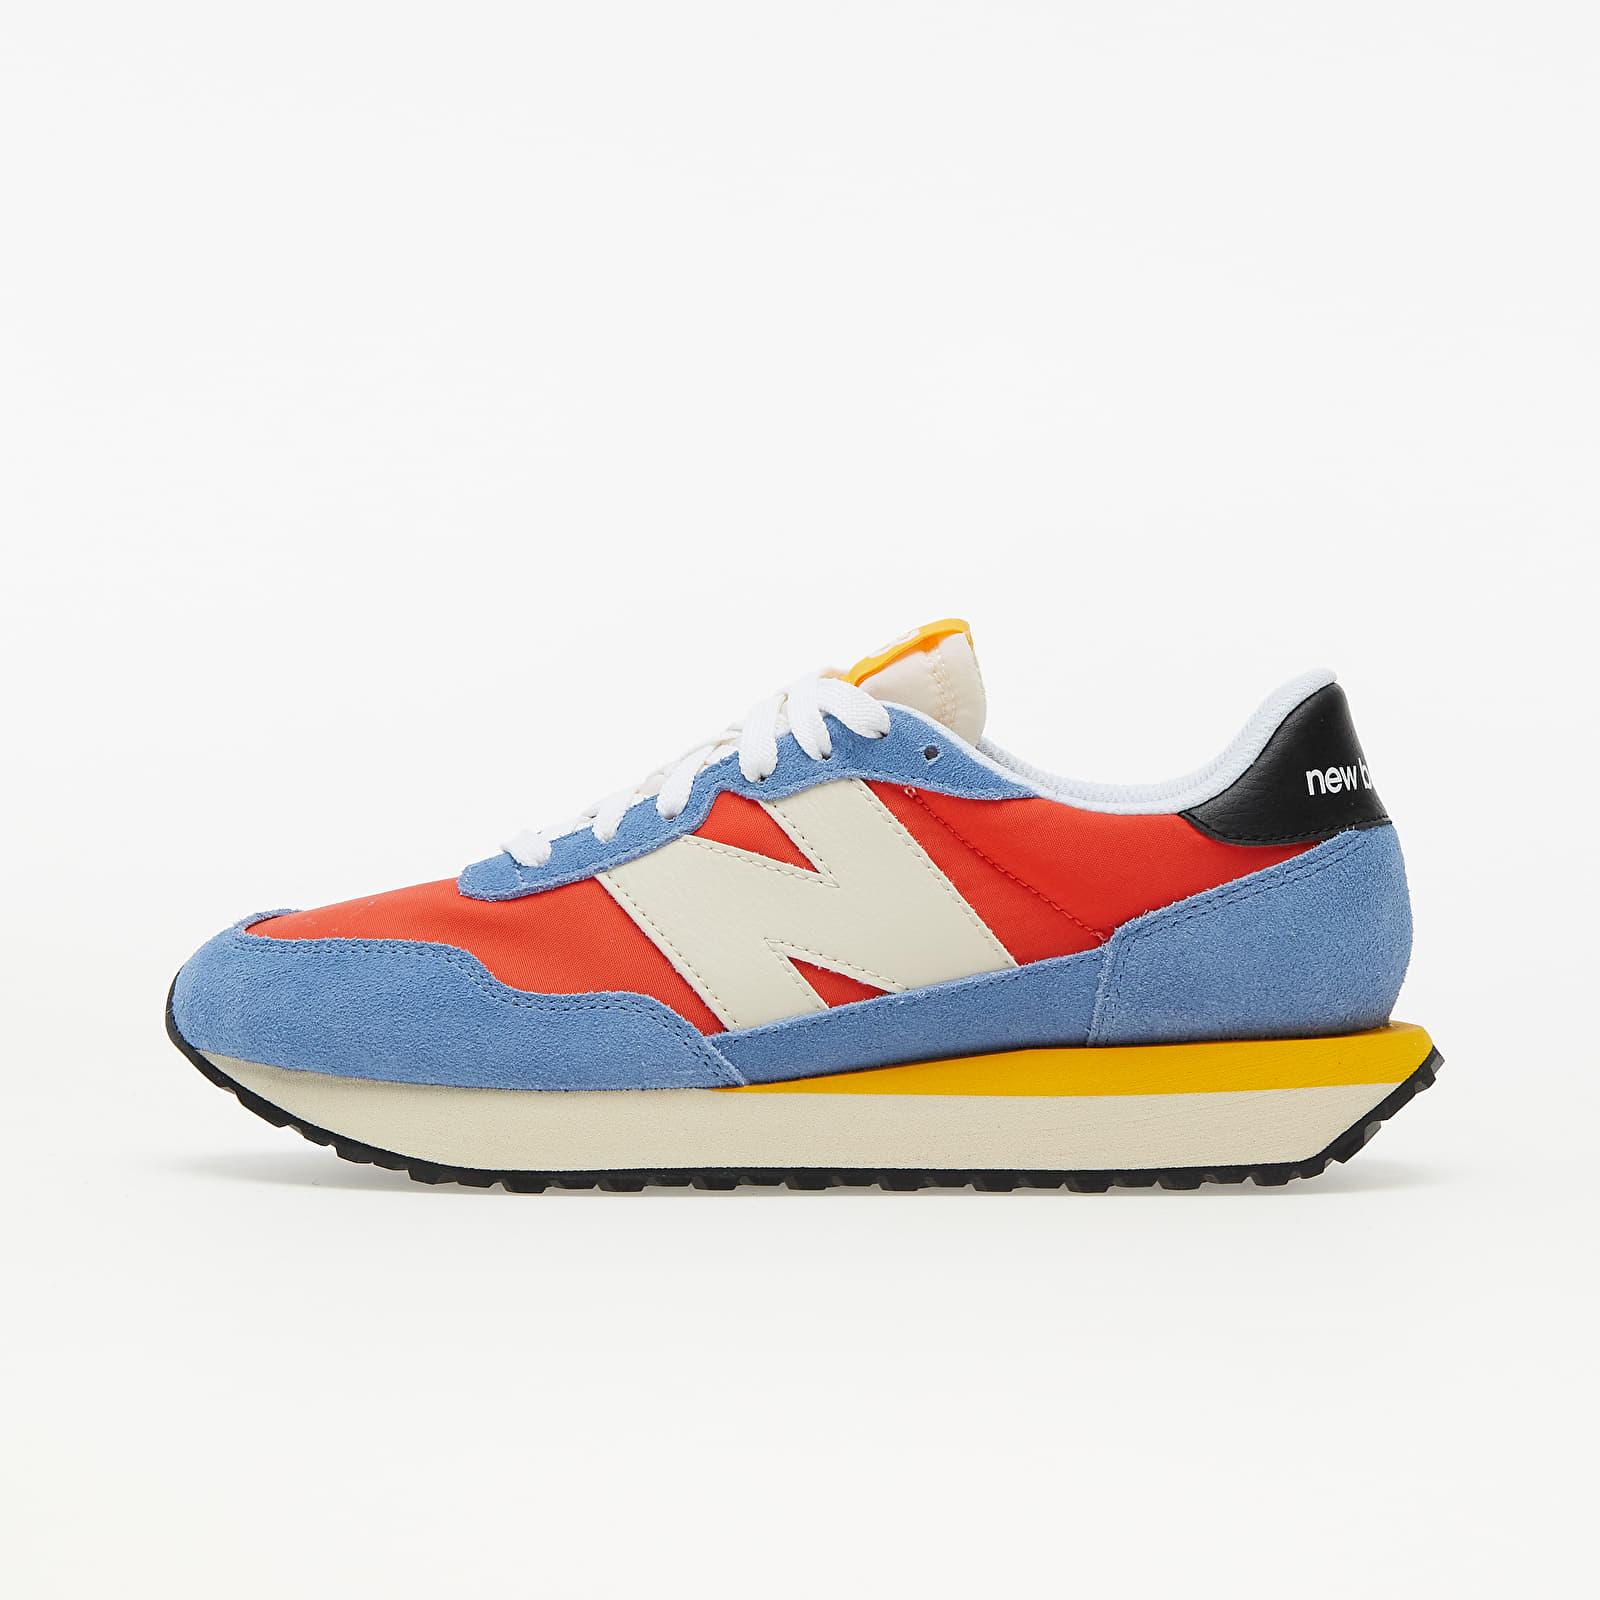 New Balance 237 Blue/ Red EUR 37